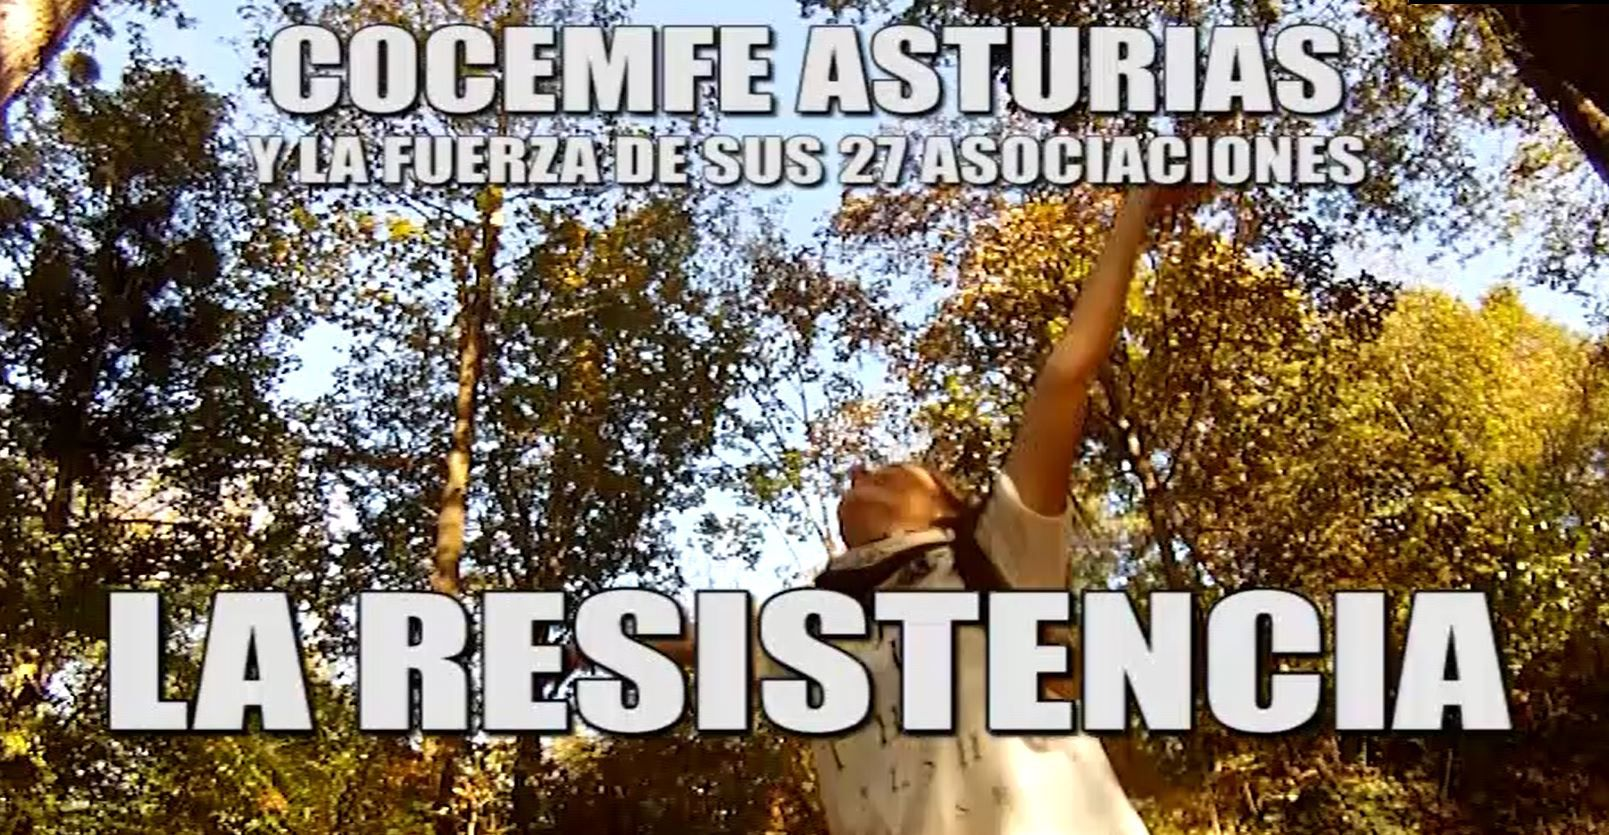 COCEMFE Asturias le planta cara al coronavirus